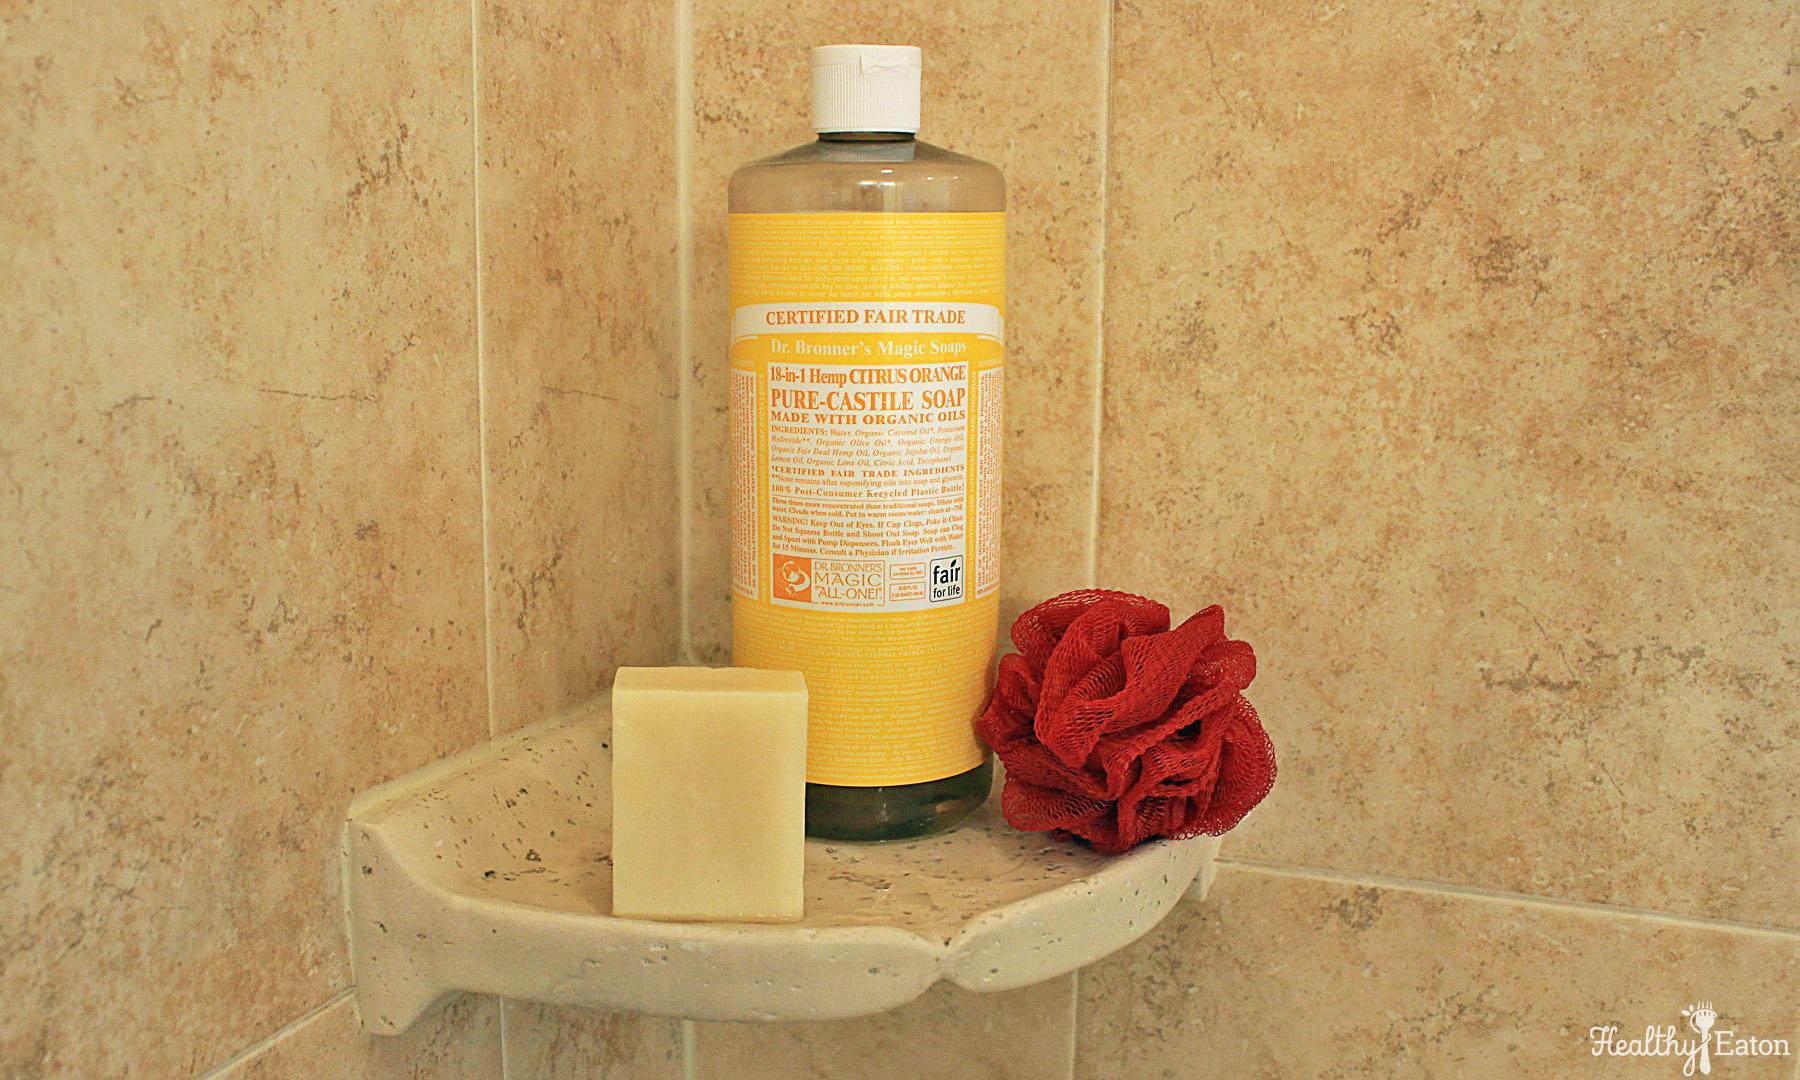 Product Review: JR Liggett's Shampoo Bar - Healthy Eaton